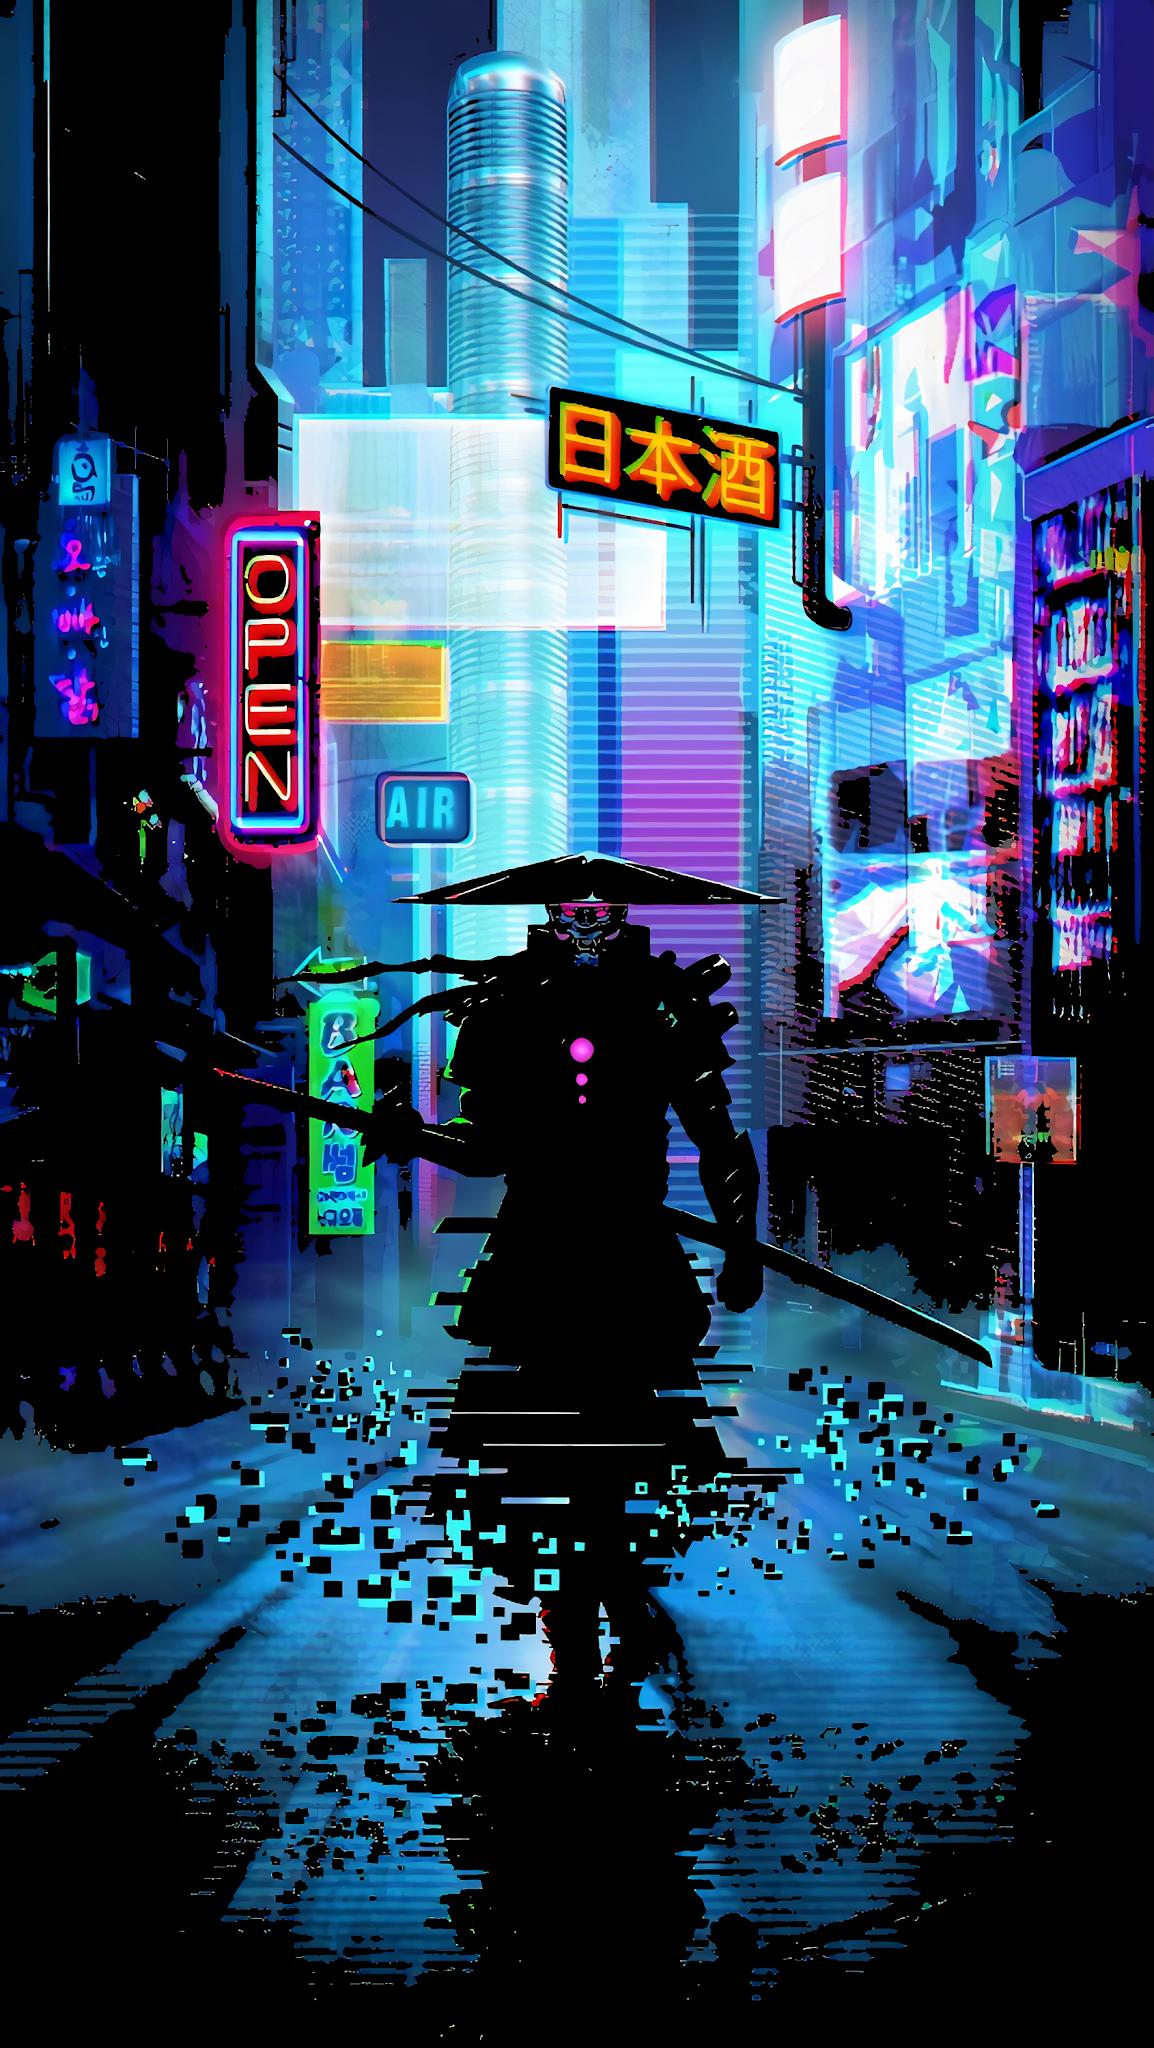 Cyber Samurai Mobile Wallpaperr Samurai Wallpaper Futuristic Samurai Cyberpunk Aesthetic